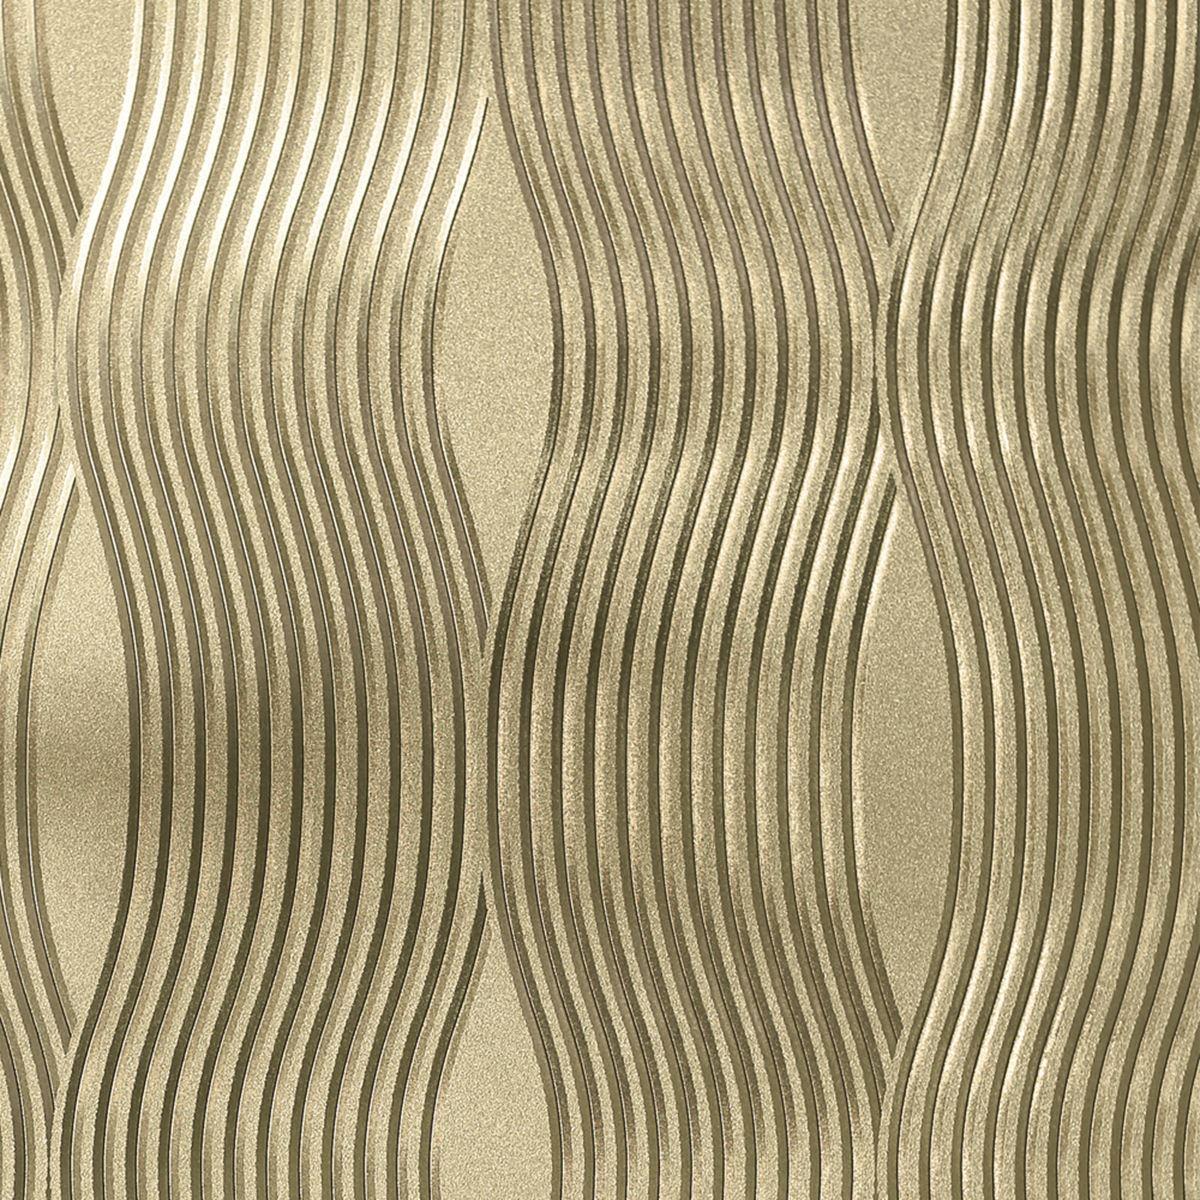 Arthouse-Feuille-Metallique-Vinyle-Papier-Peint-3-Designs-ROSE-GOLD-SILVER-amp-plus